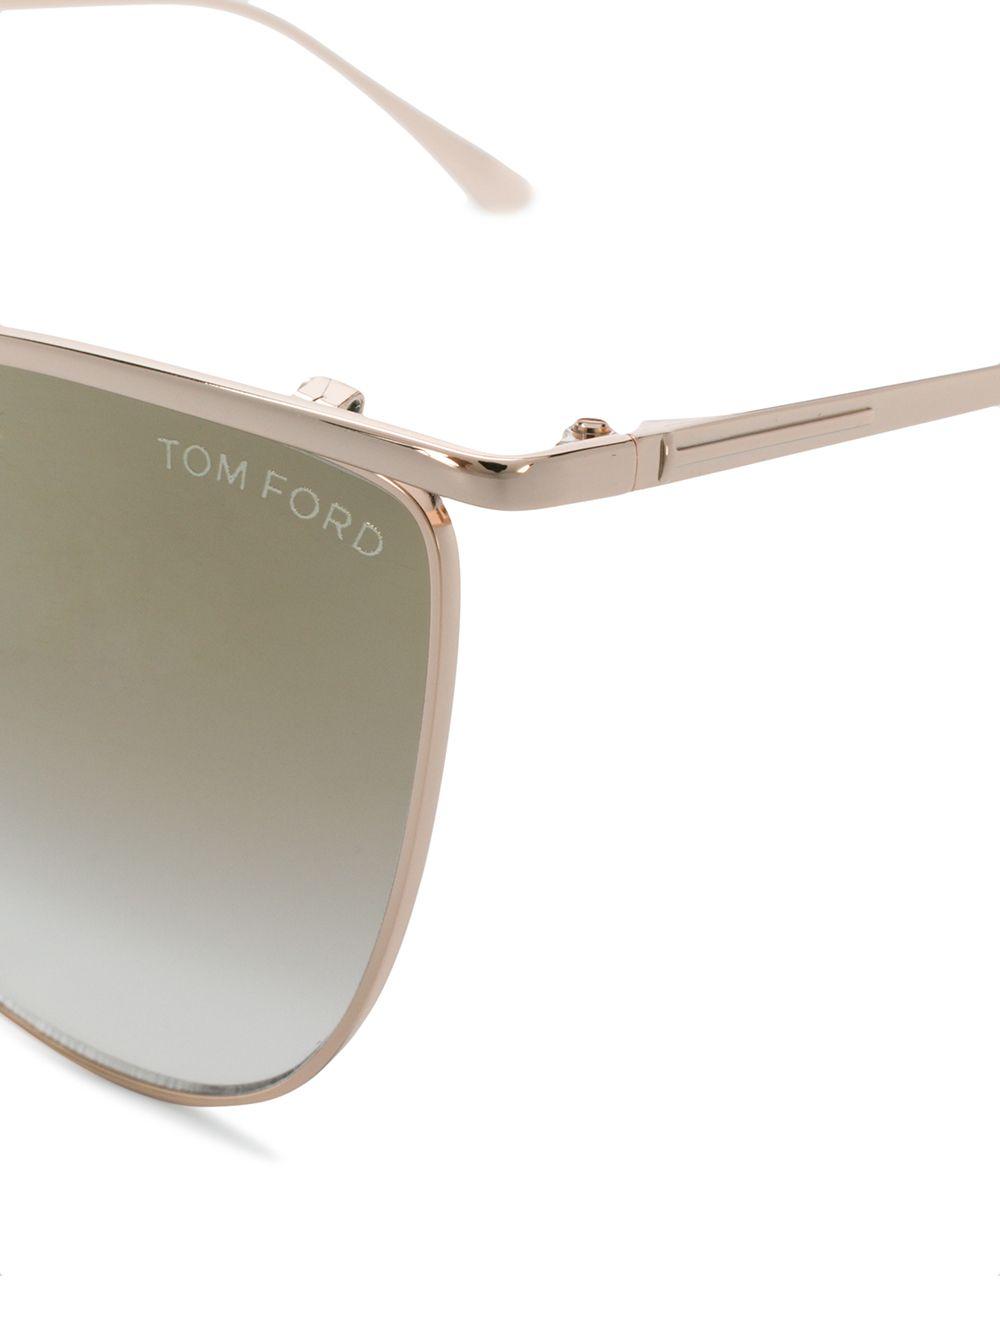 Tom Ford | солнцезащитные очки Veronica в квадратной оправе | Clouty